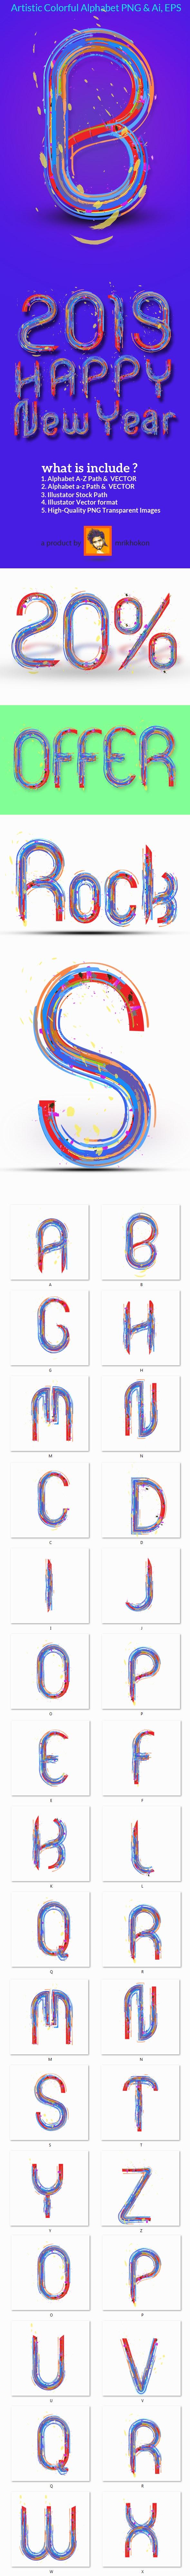 Artistic Colorful Alphabet - Brushes Illustrator